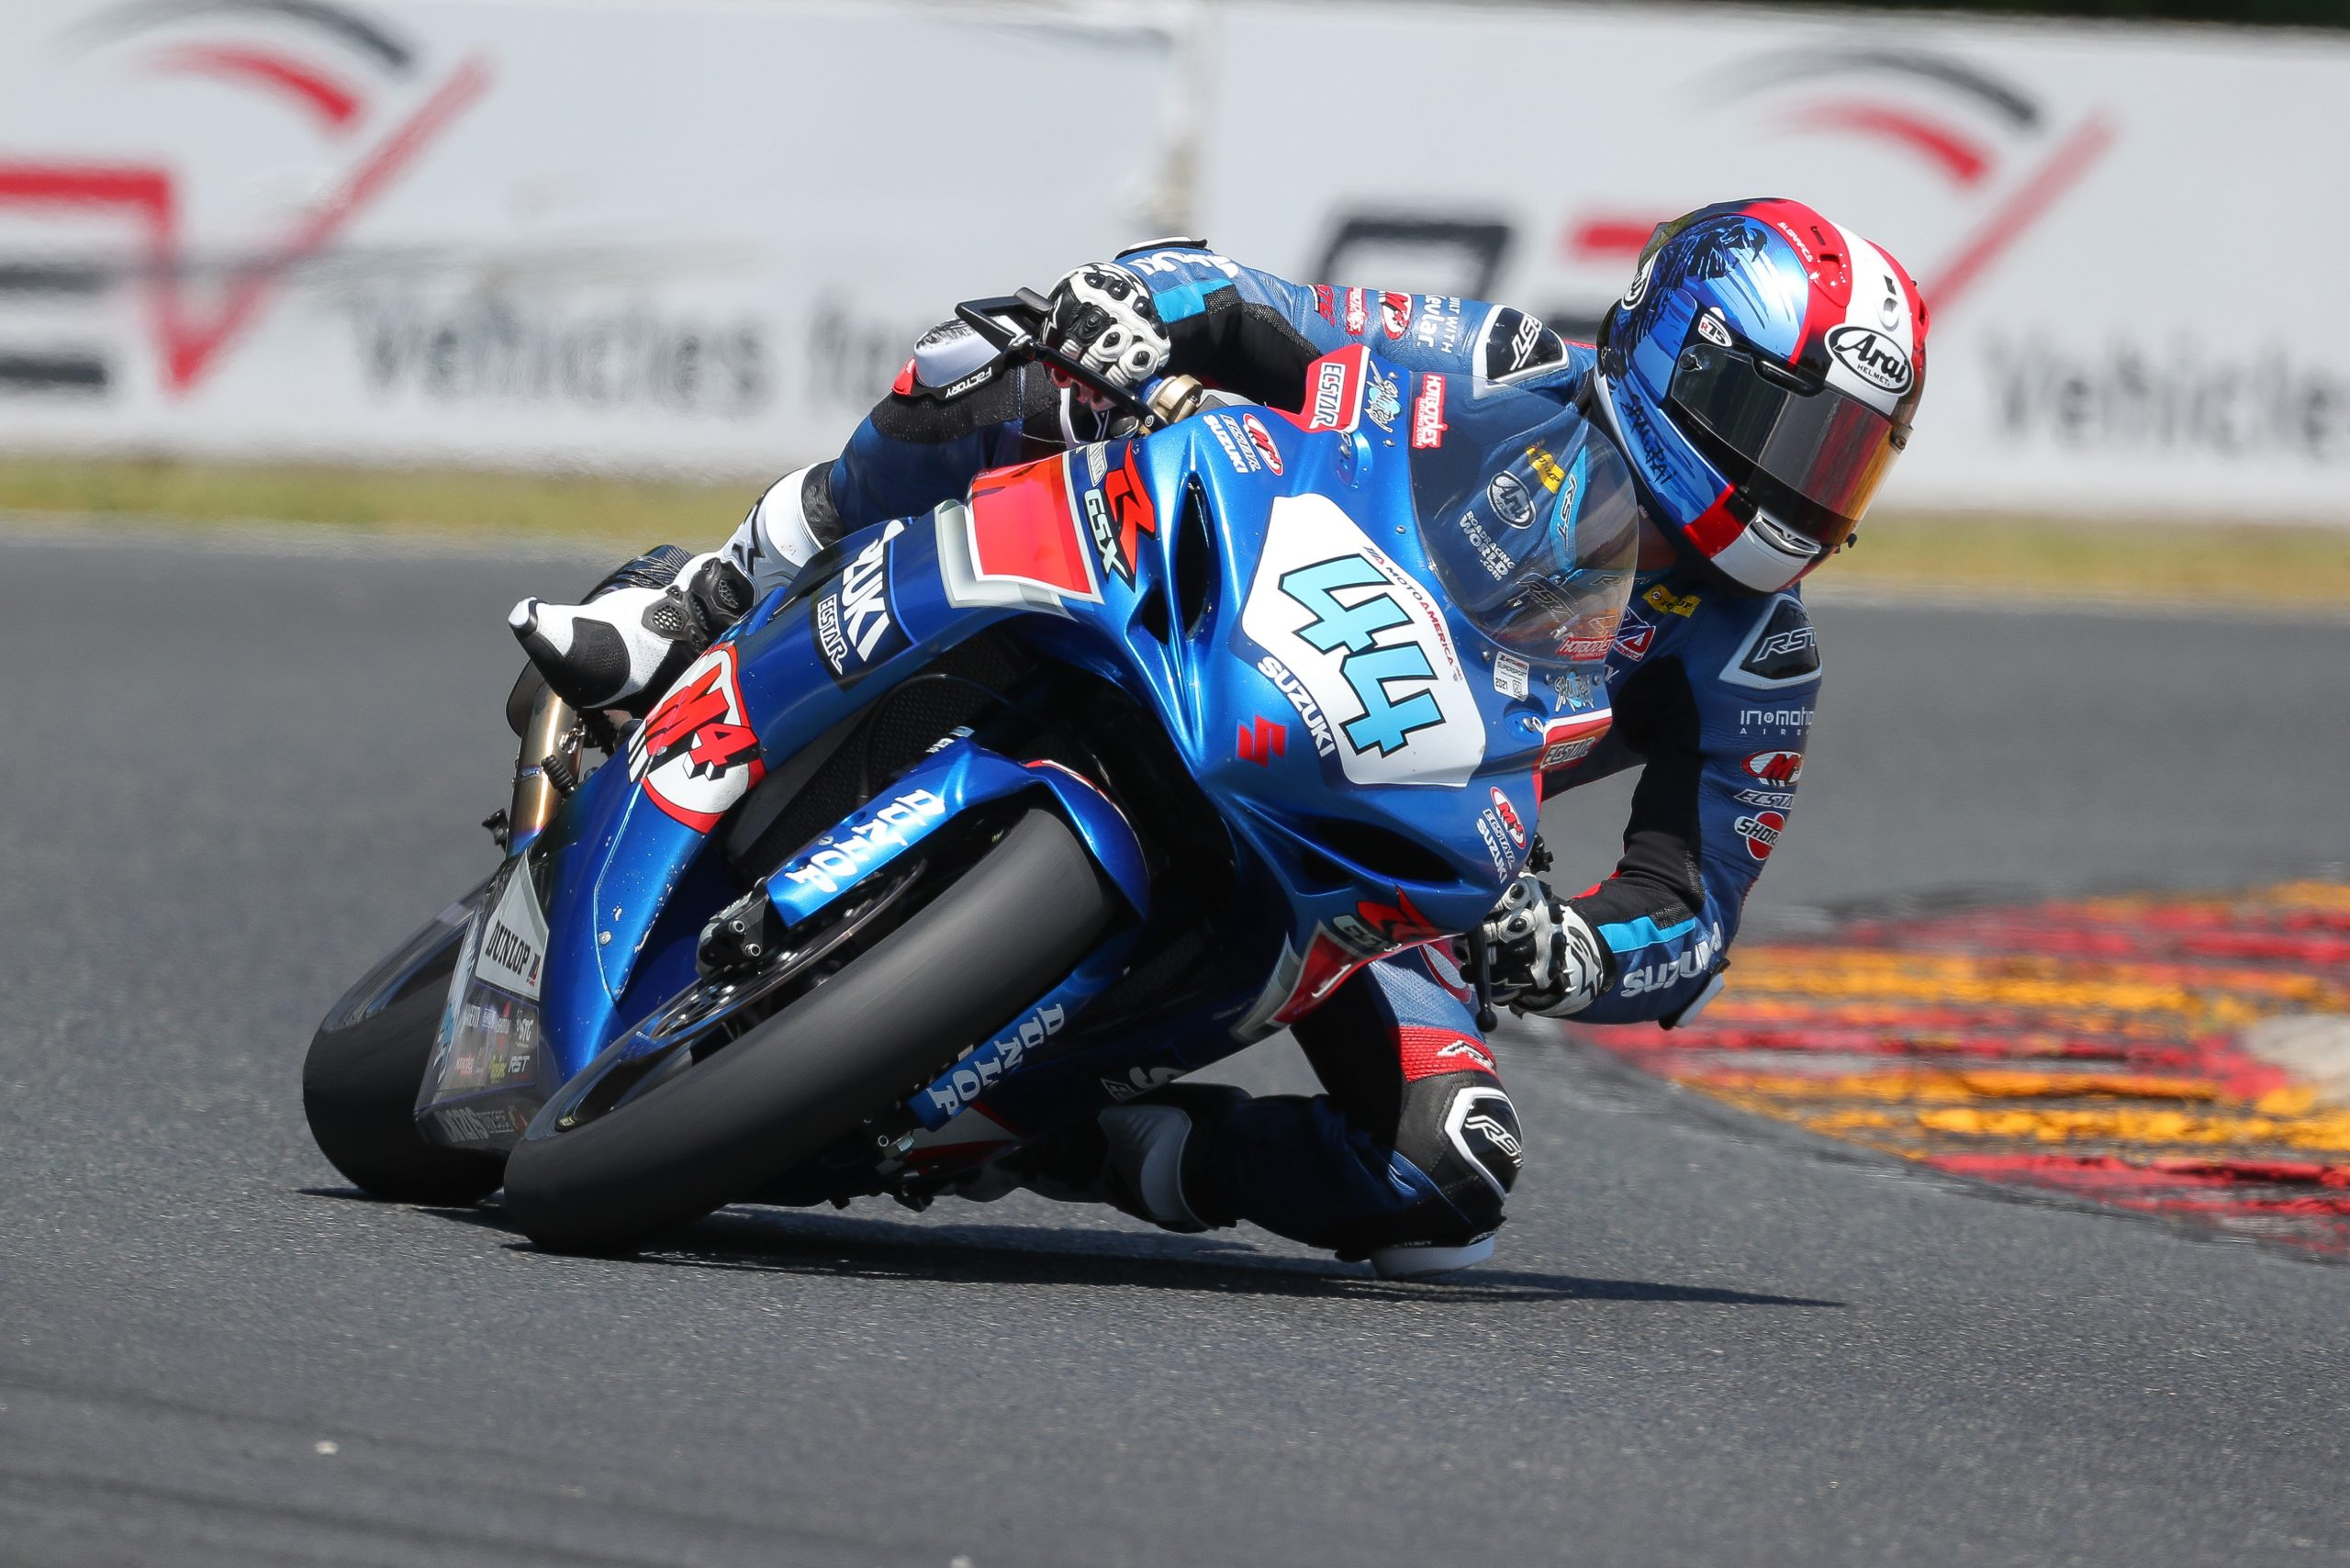 210614 Sam Lochoff (44) took his first podium finish in the Supersport class on his Suzuki GSX-R600